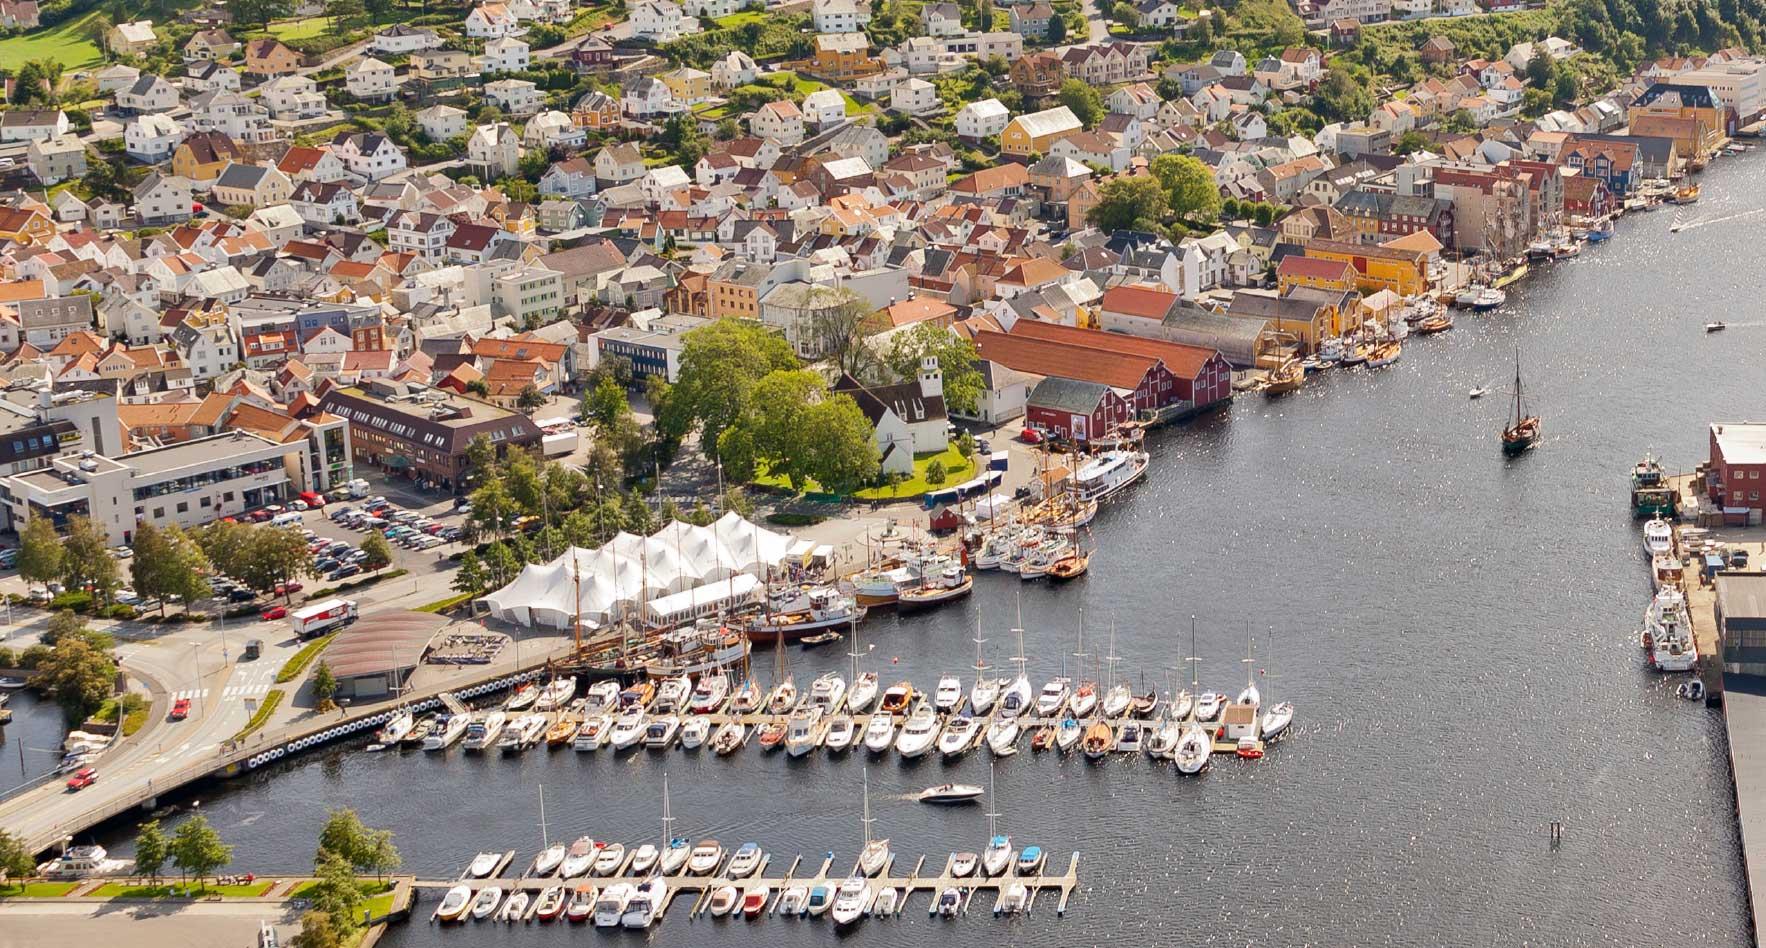 Flyfoto over sentrum